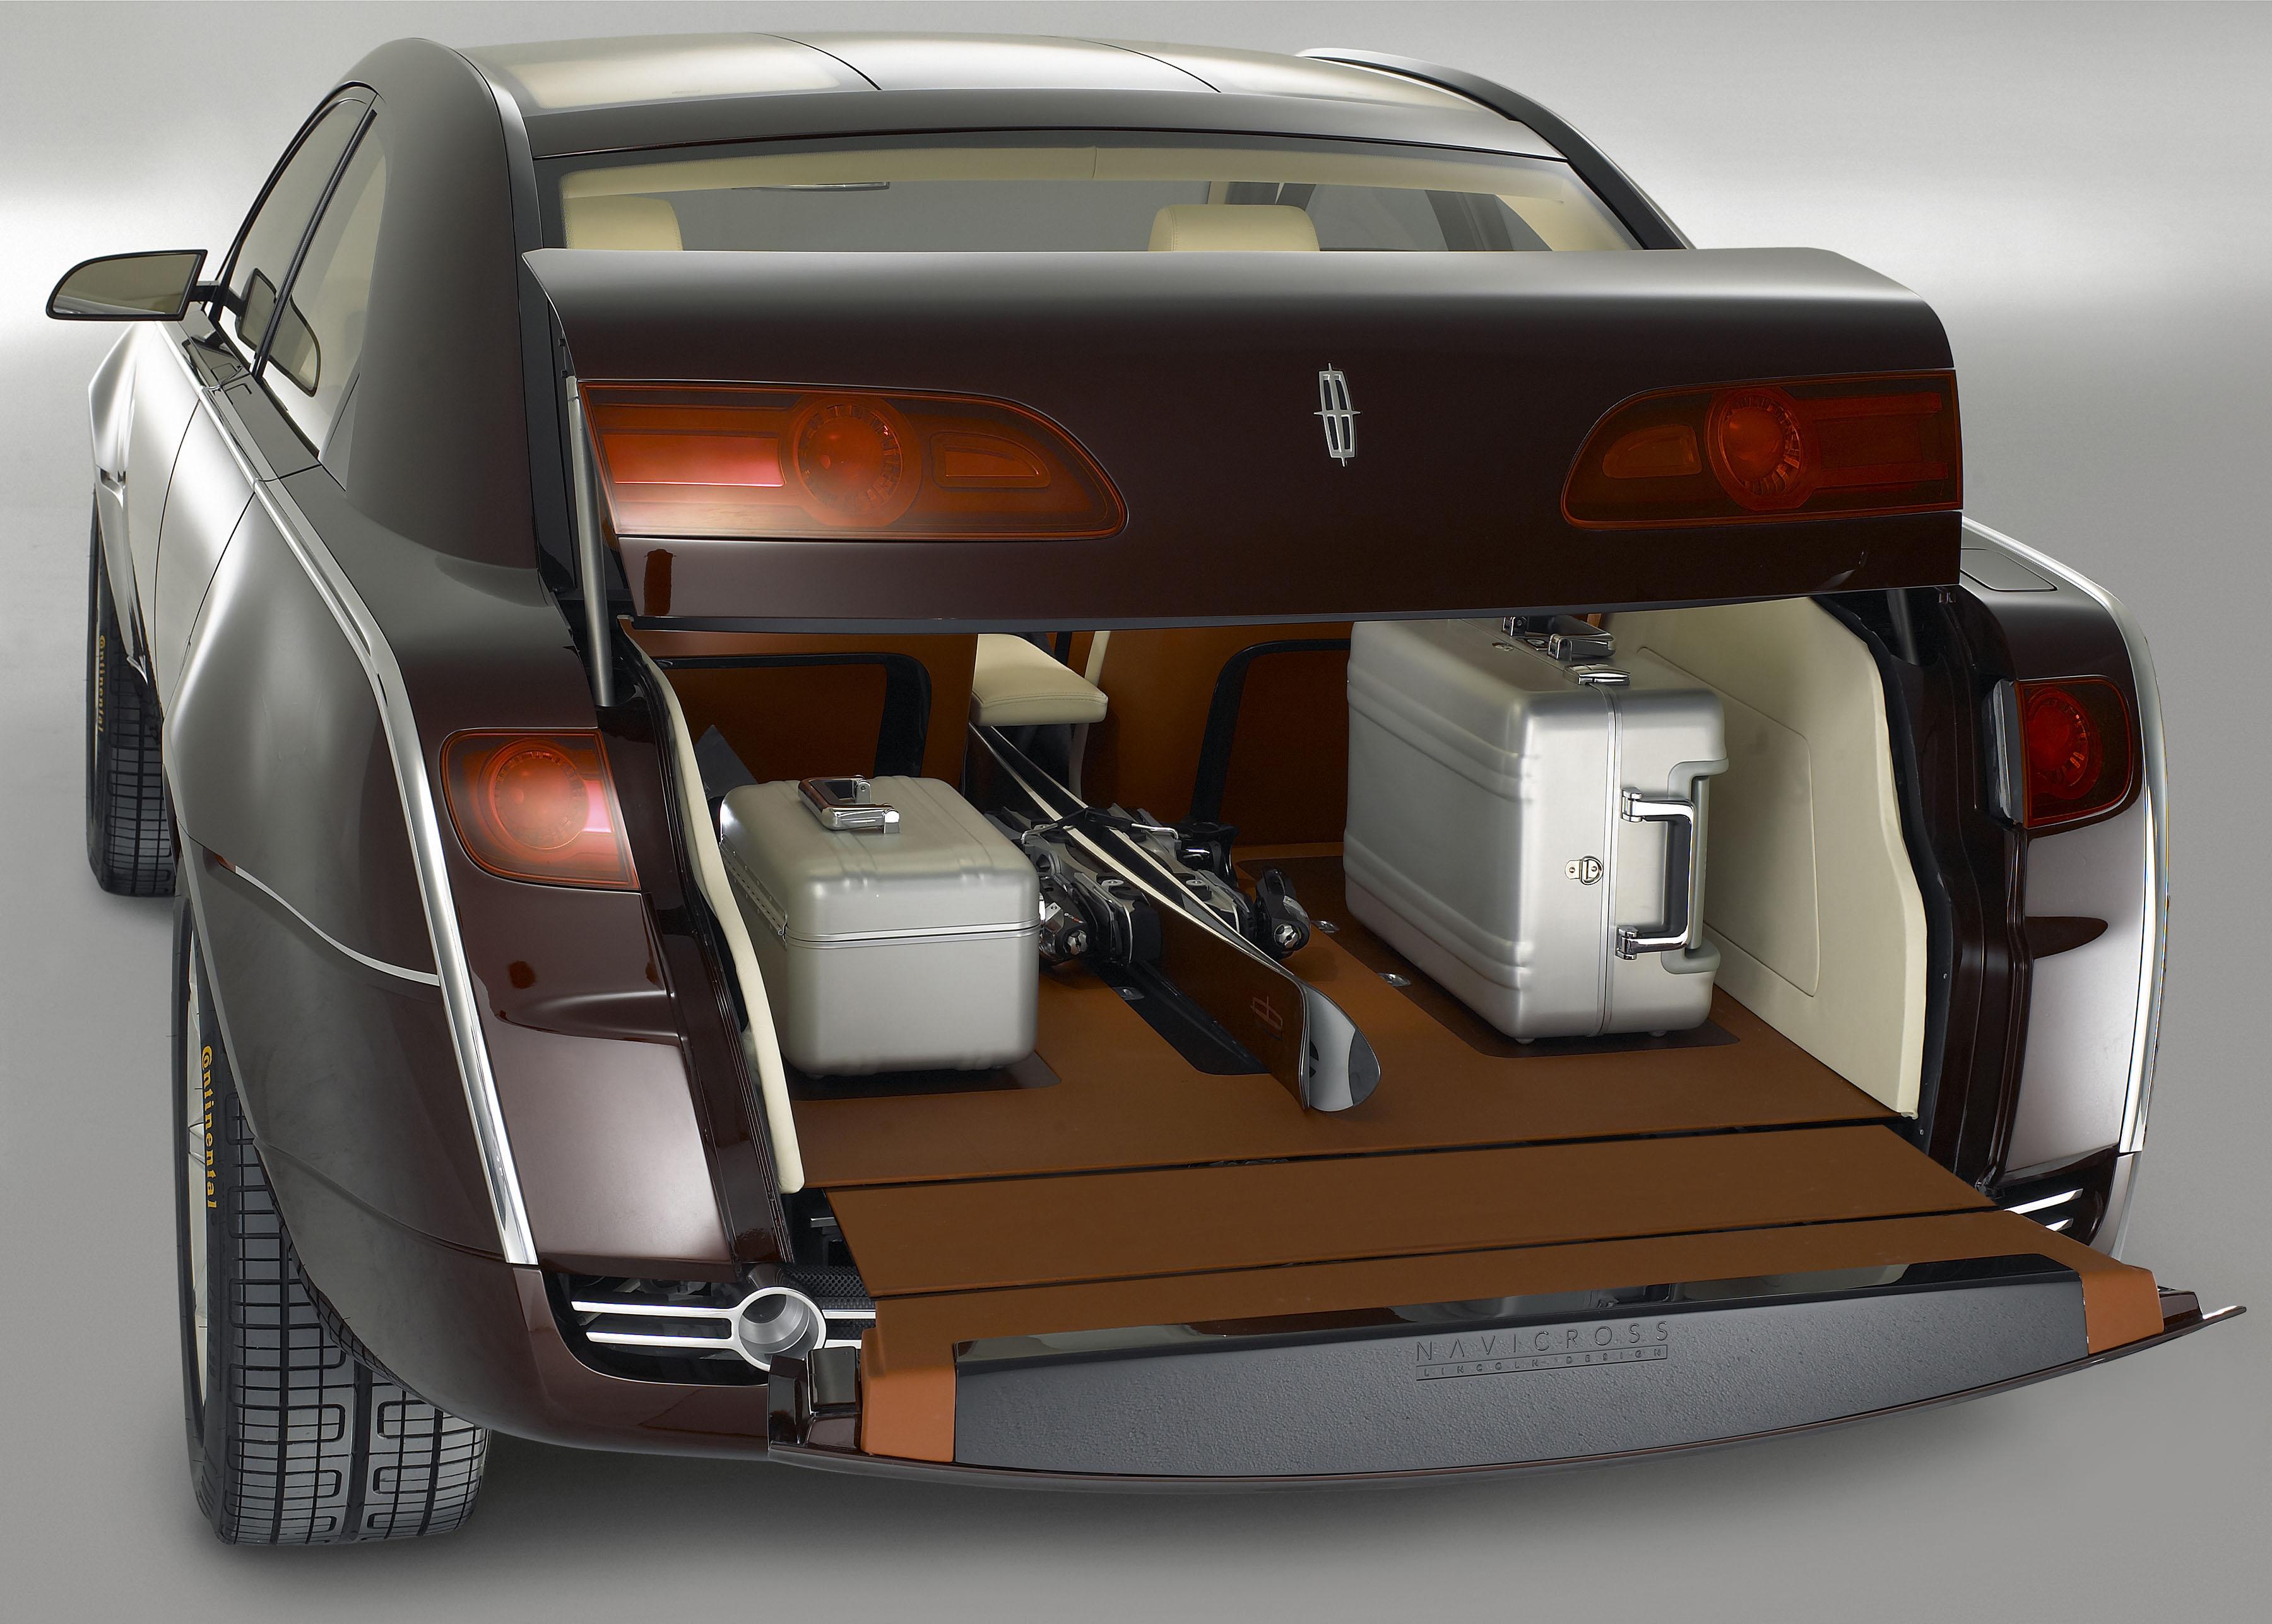 https://www.automobilesreview.com/gallery/navicross-concept/lincoln-navicross-concept-17.jpg